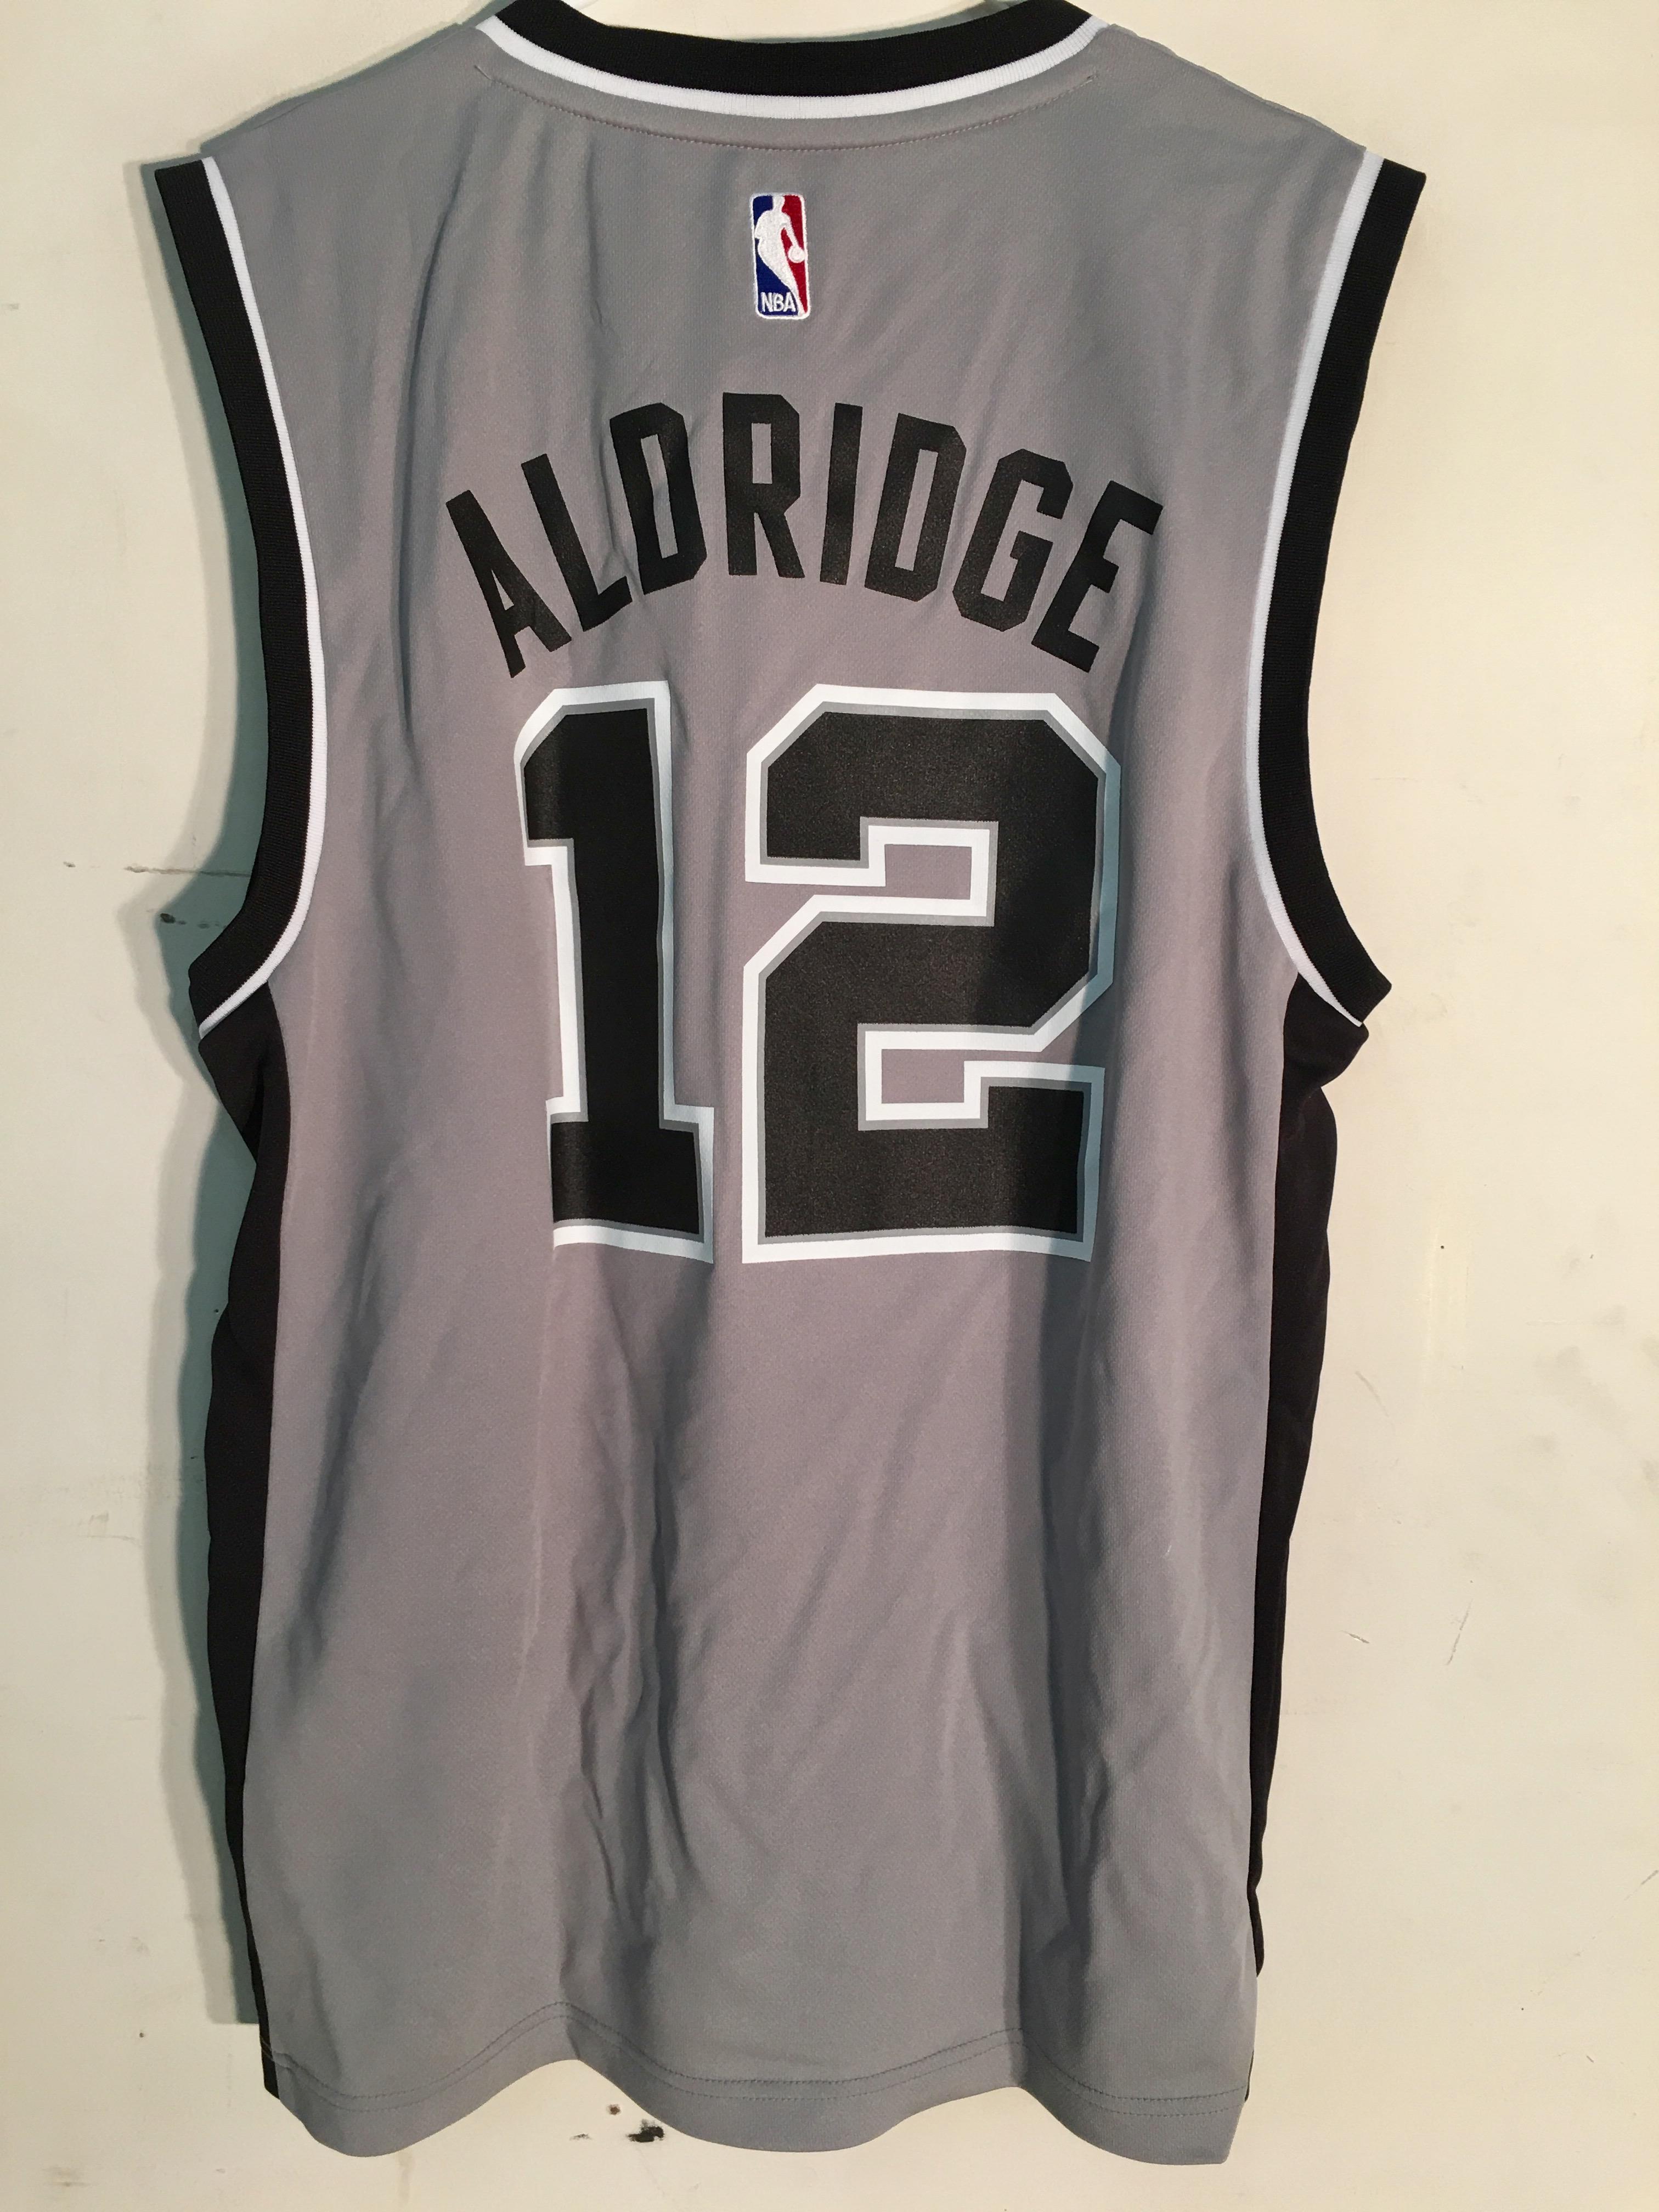 3648c0eeb Adidas NBA Jersey San Antonio Spurs LaMarcus Aldridge Grey sz M